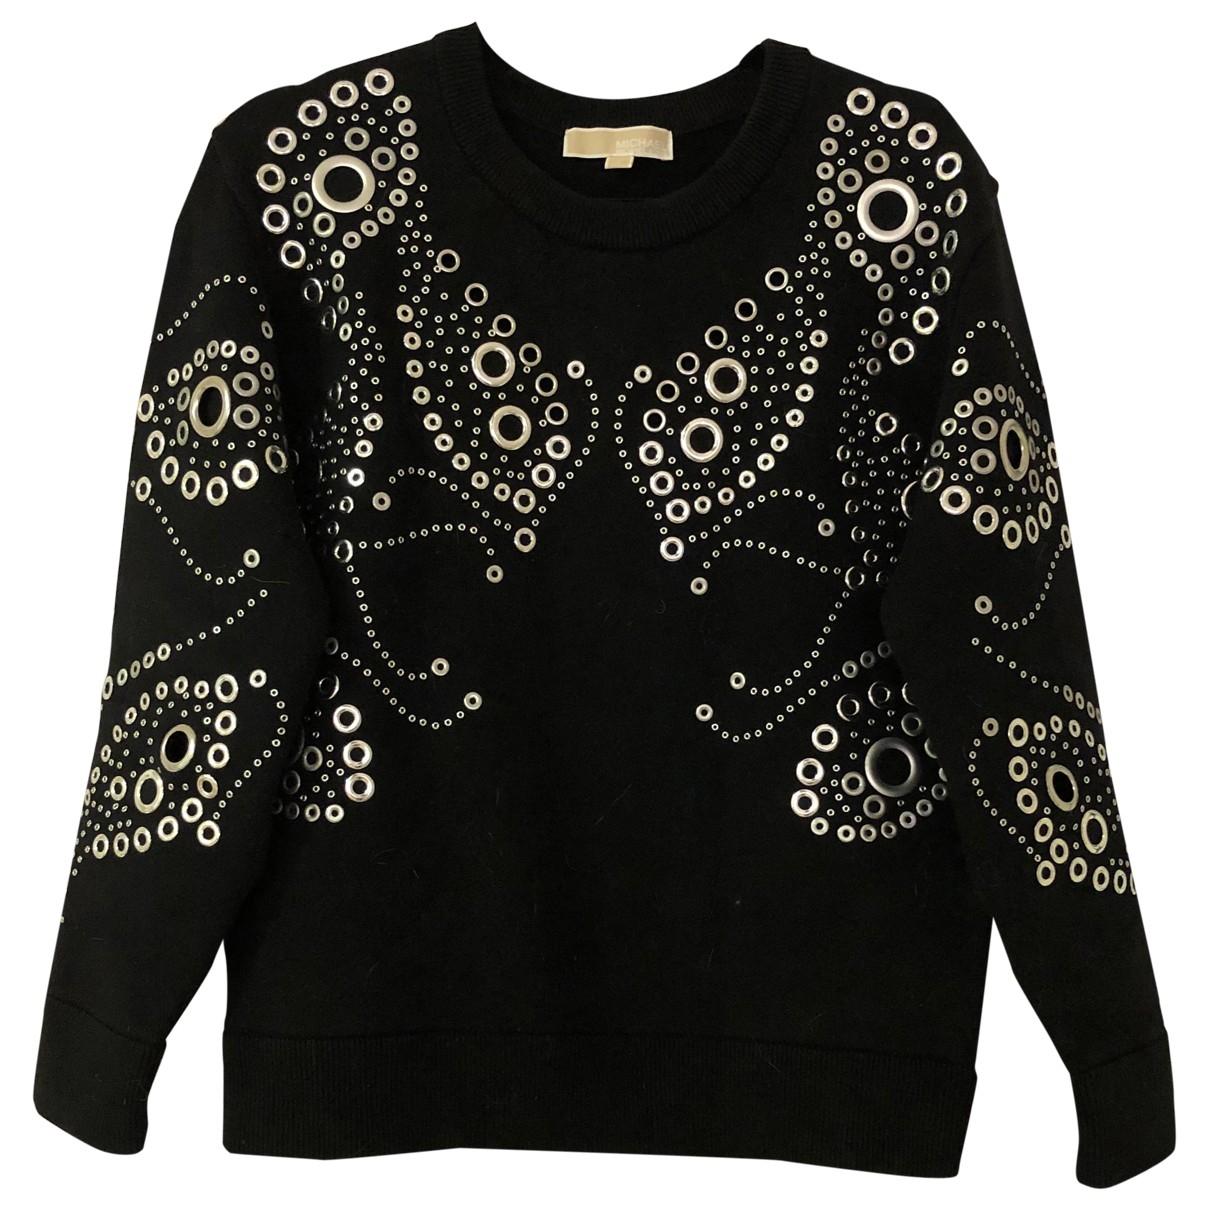 Michael Kors \N Black Cotton Knitwear for Women S International